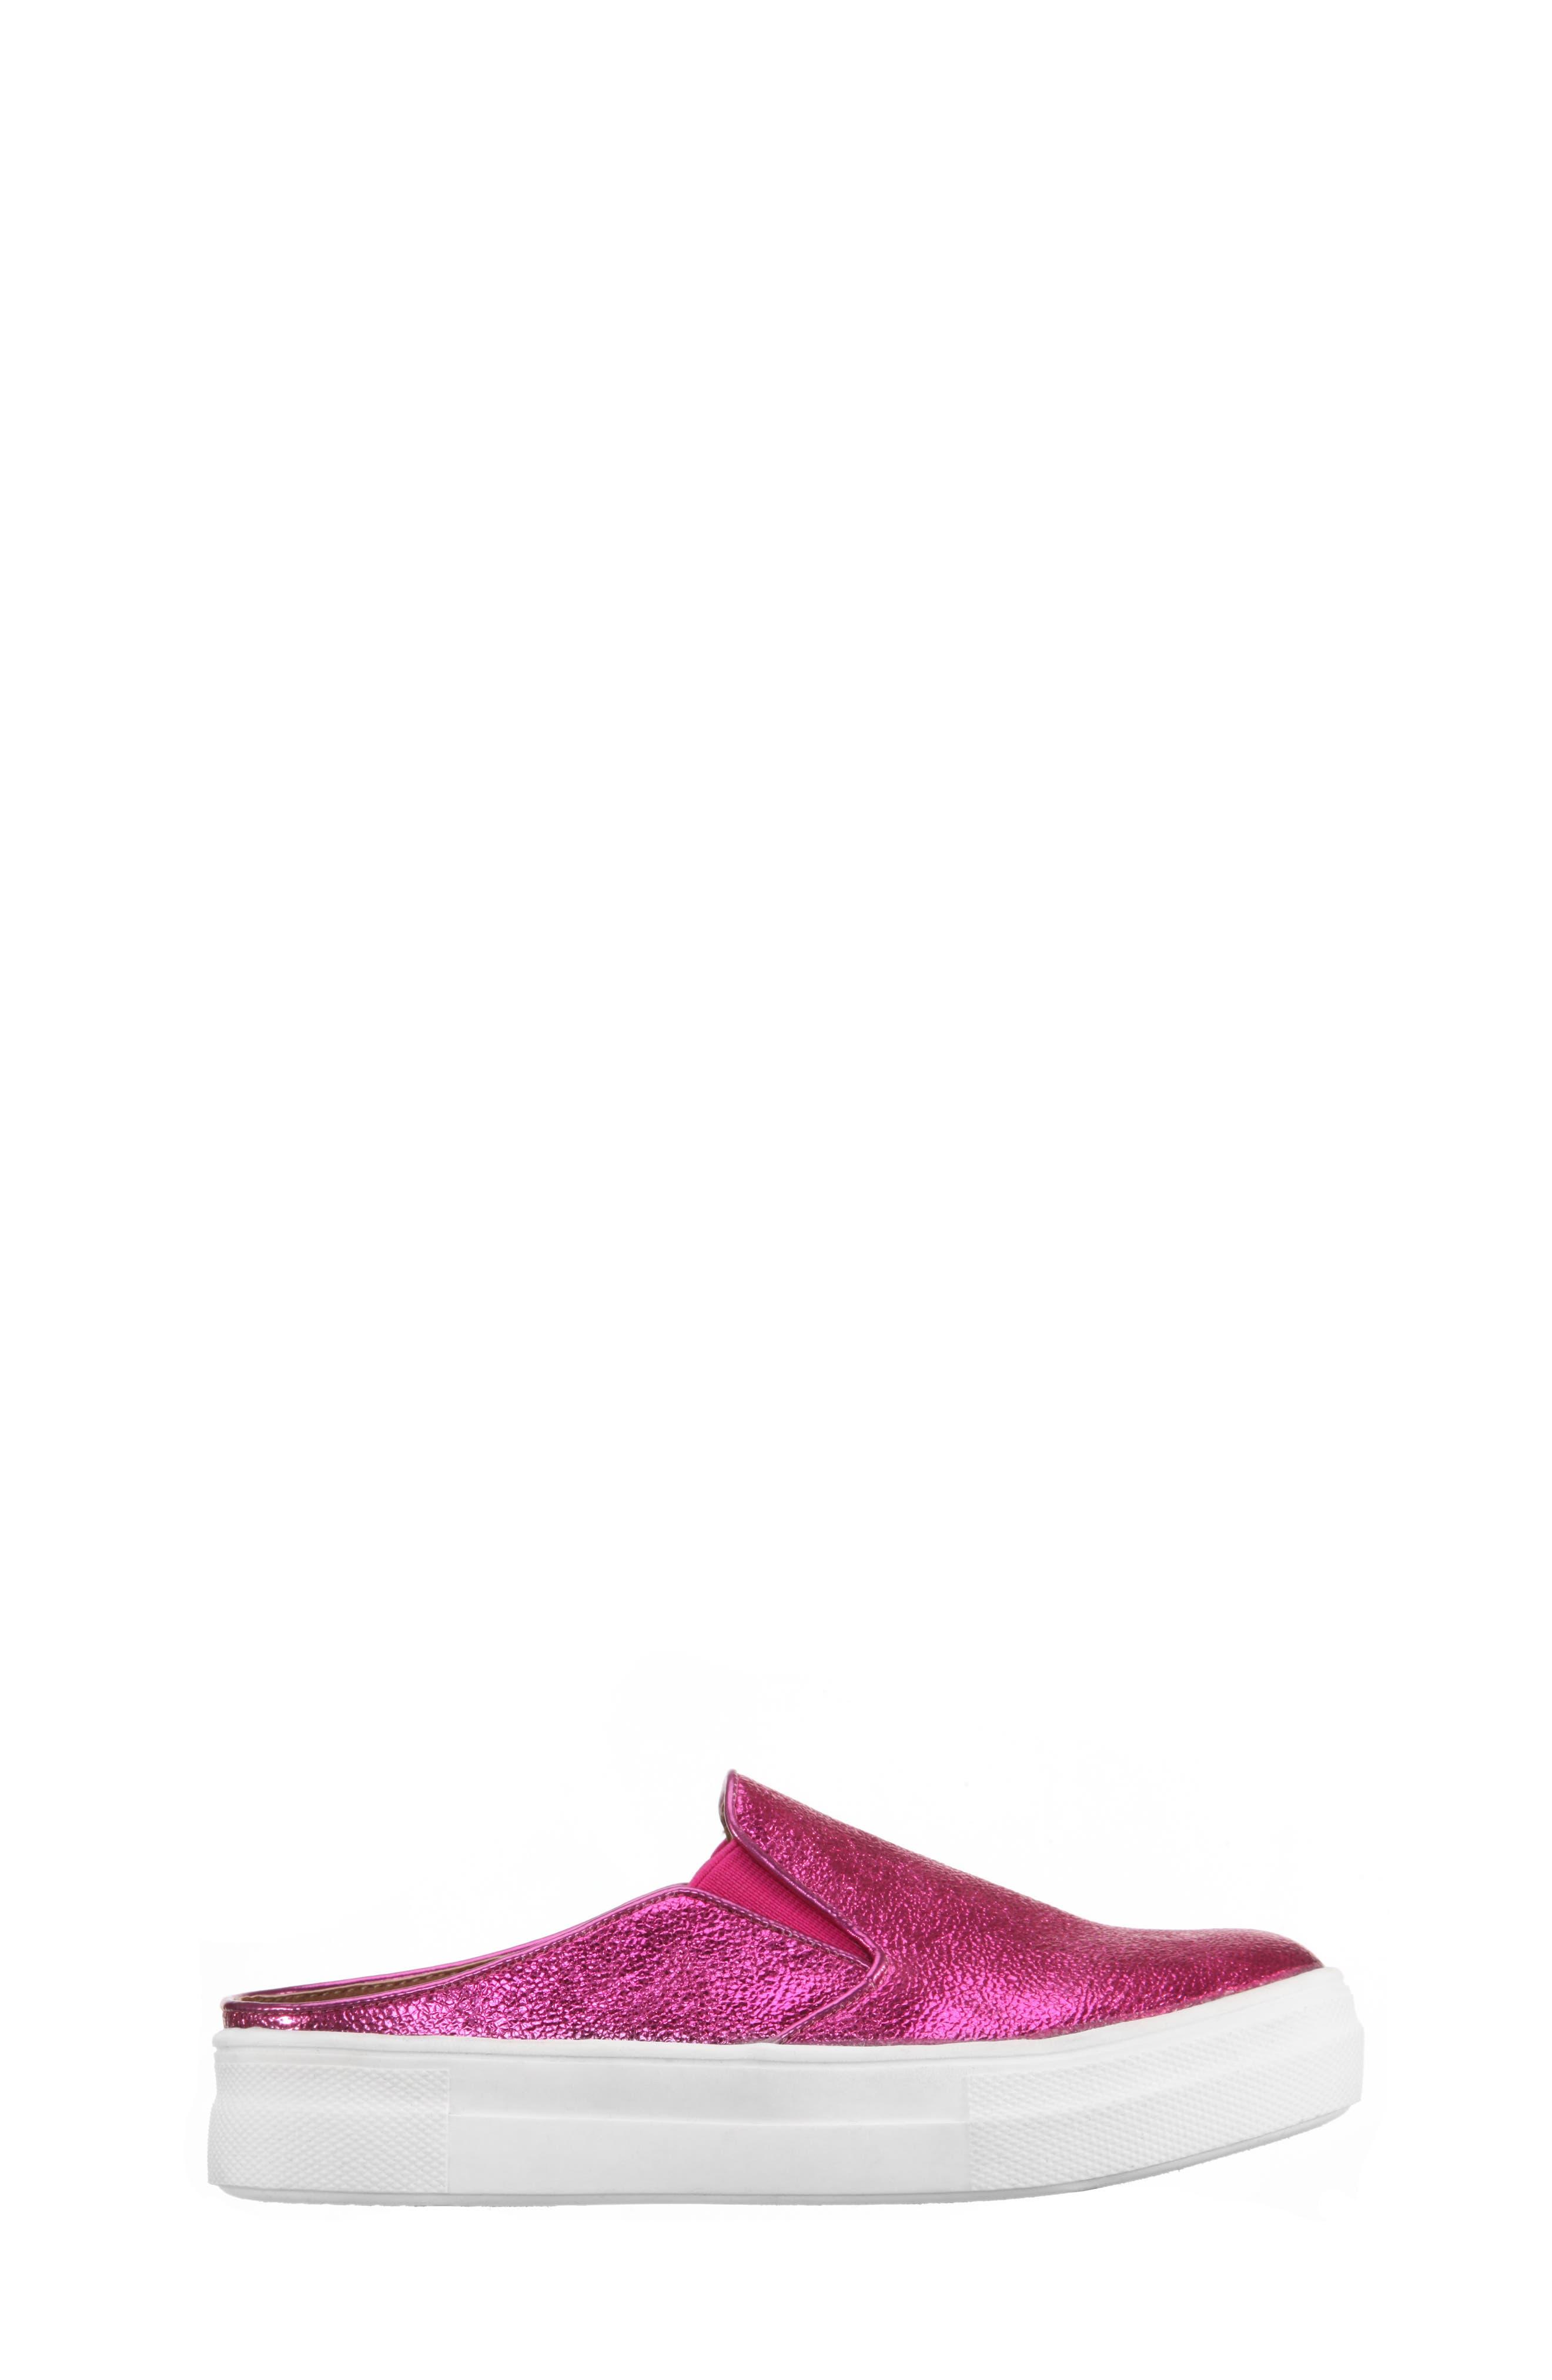 Gail Metallic Slip-On Sneaker Mule,                             Alternate thumbnail 9, color,